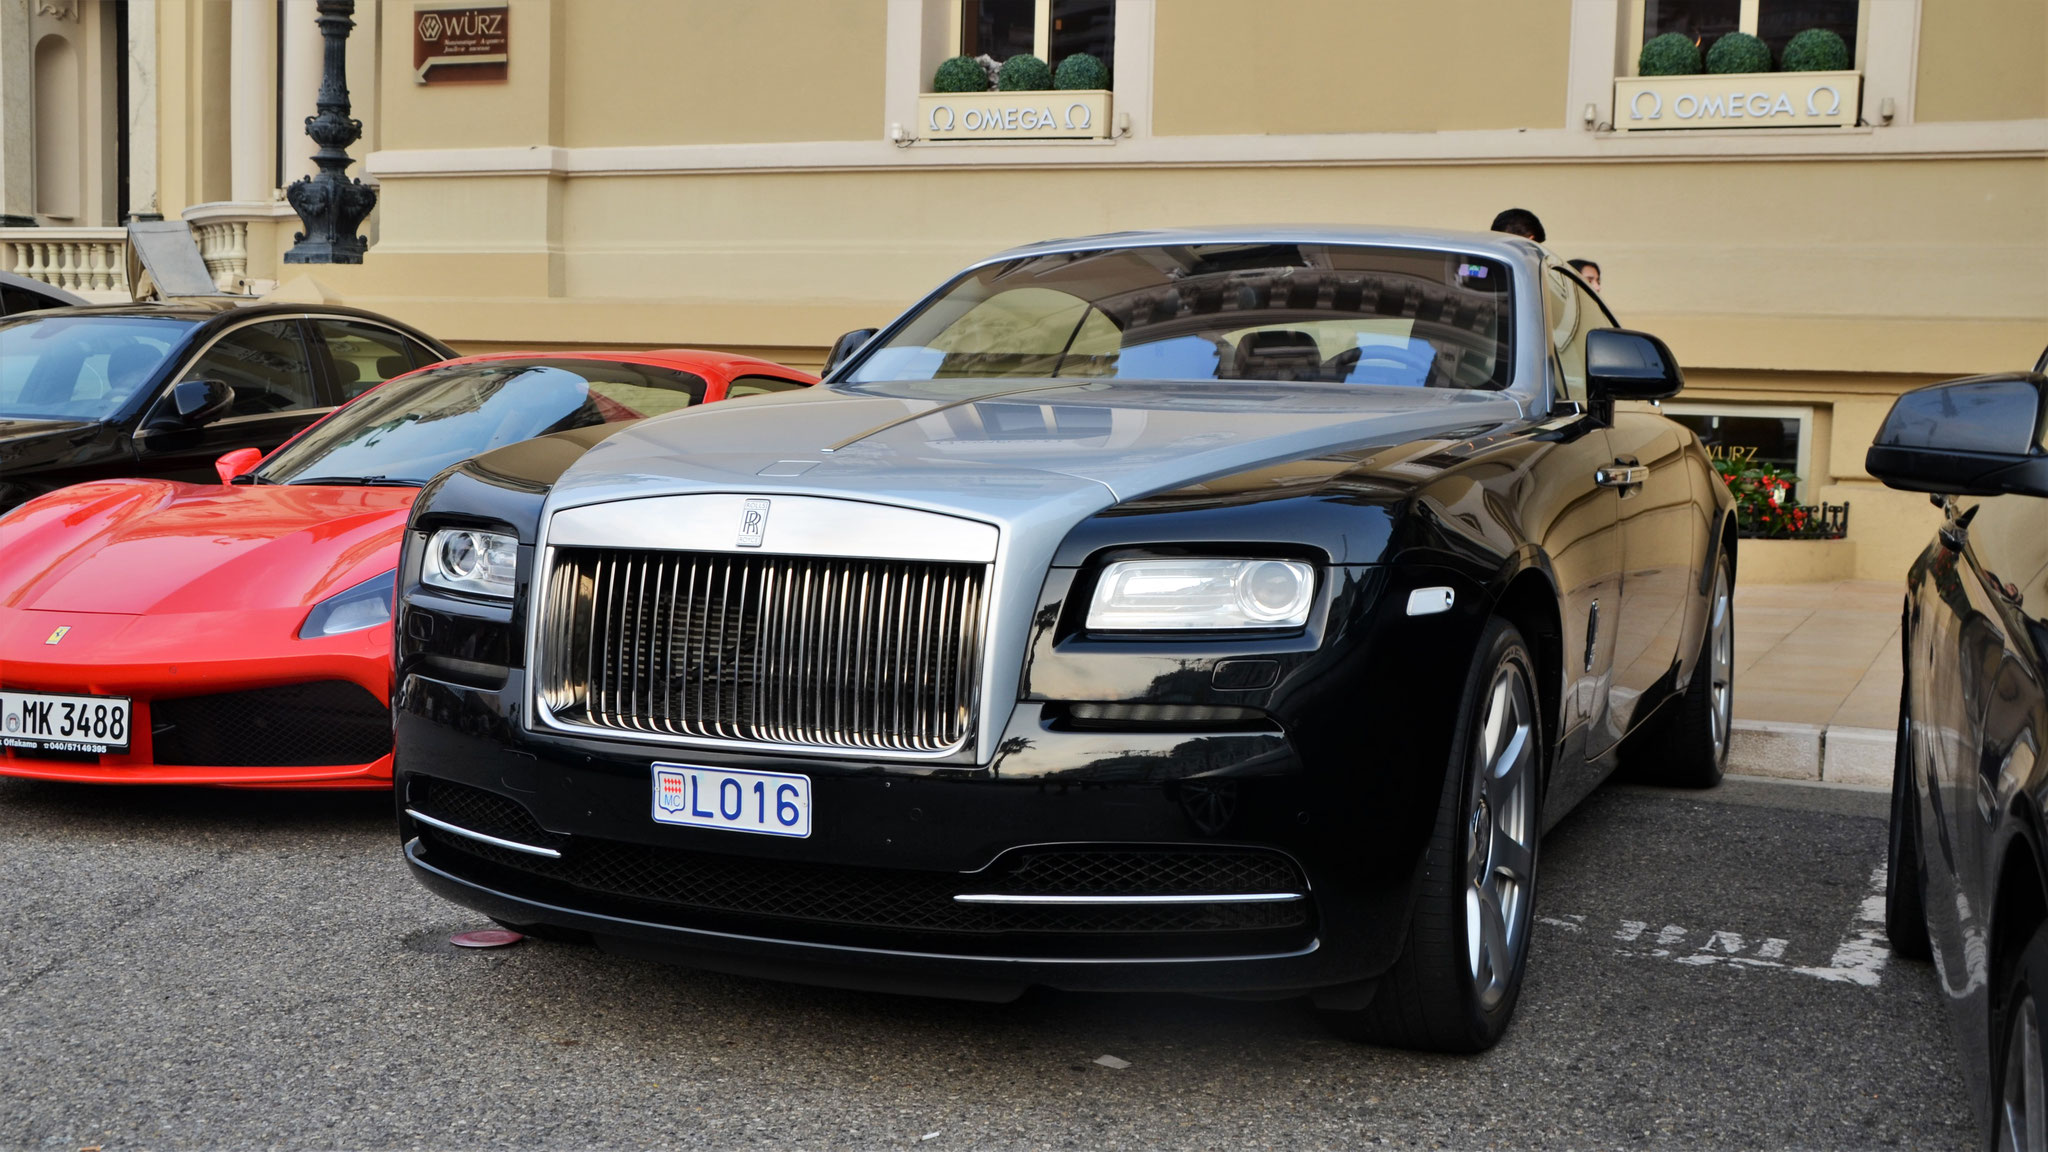 Rolls Royce Ghost - L016 (MC)